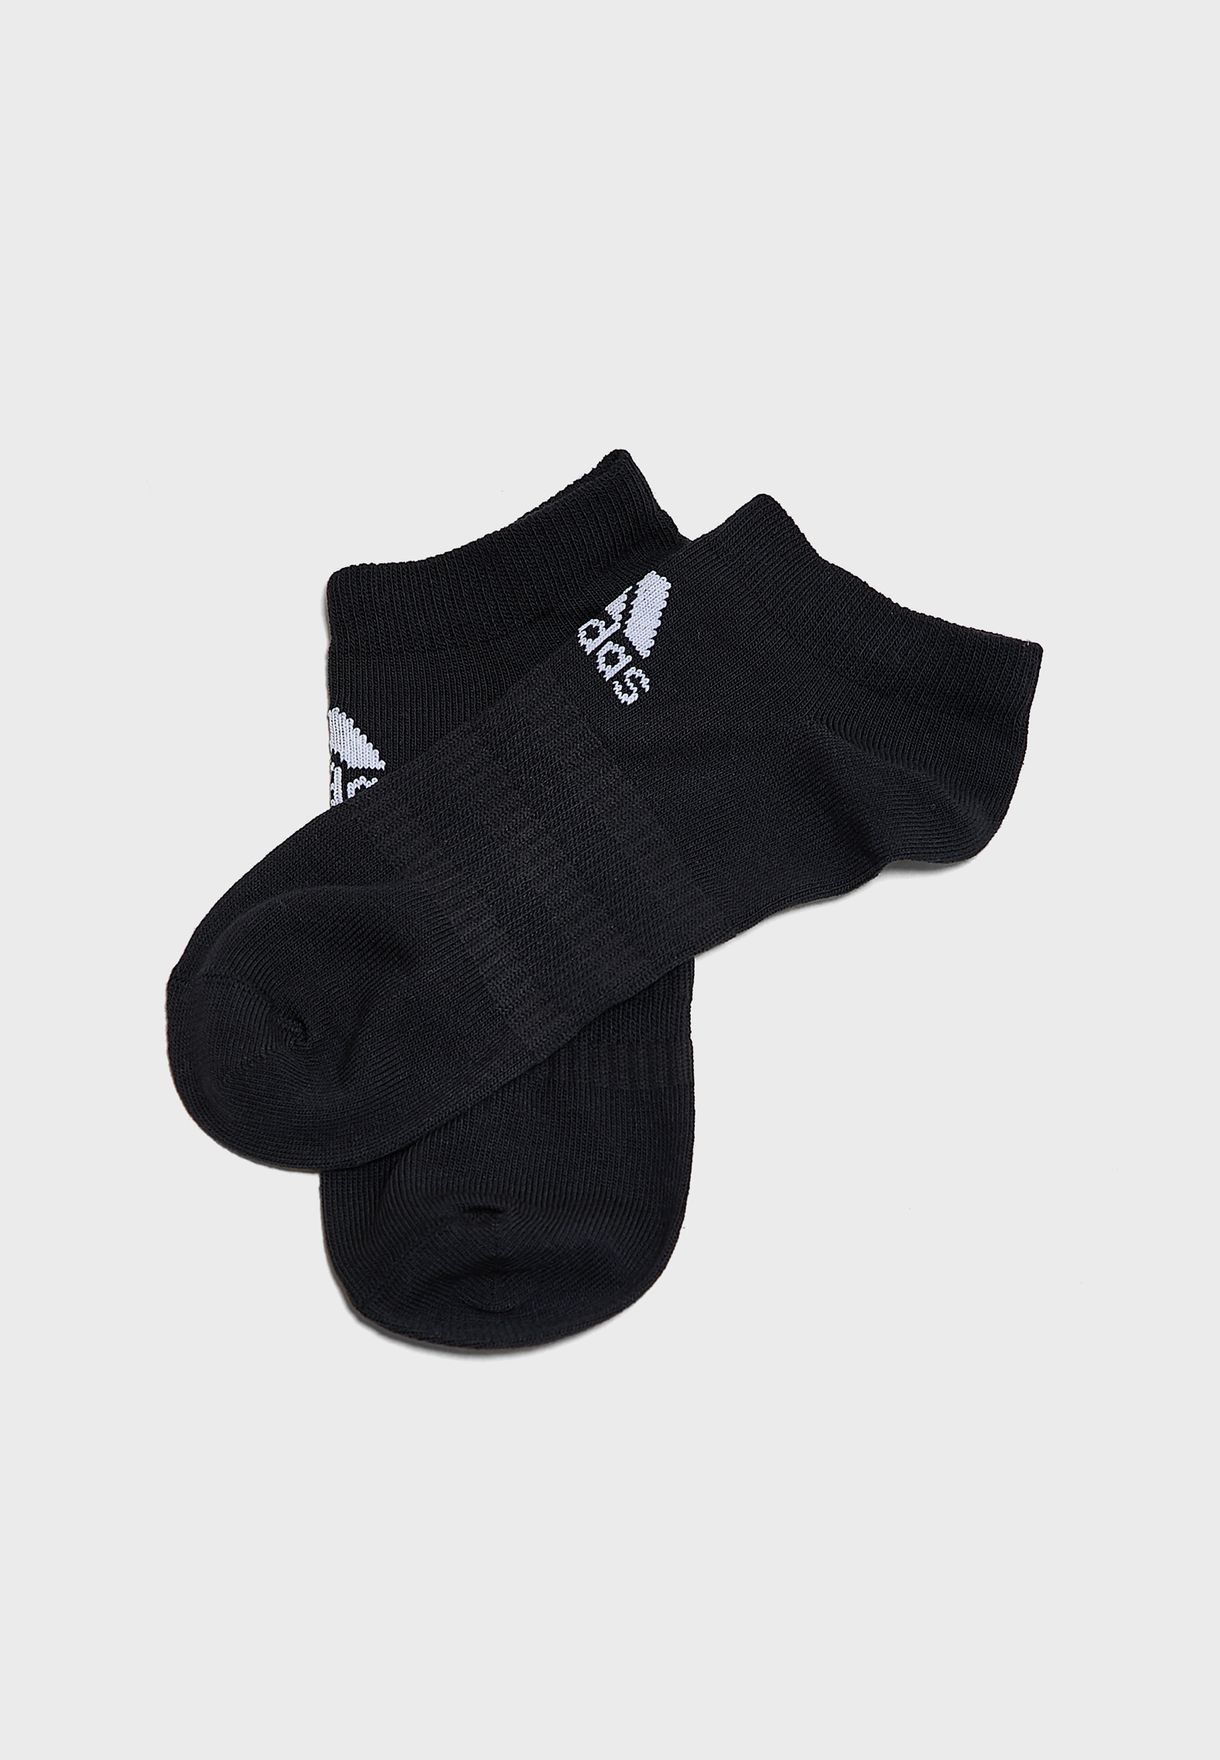 Light Essentials Sports Training Unisex No Show Socks